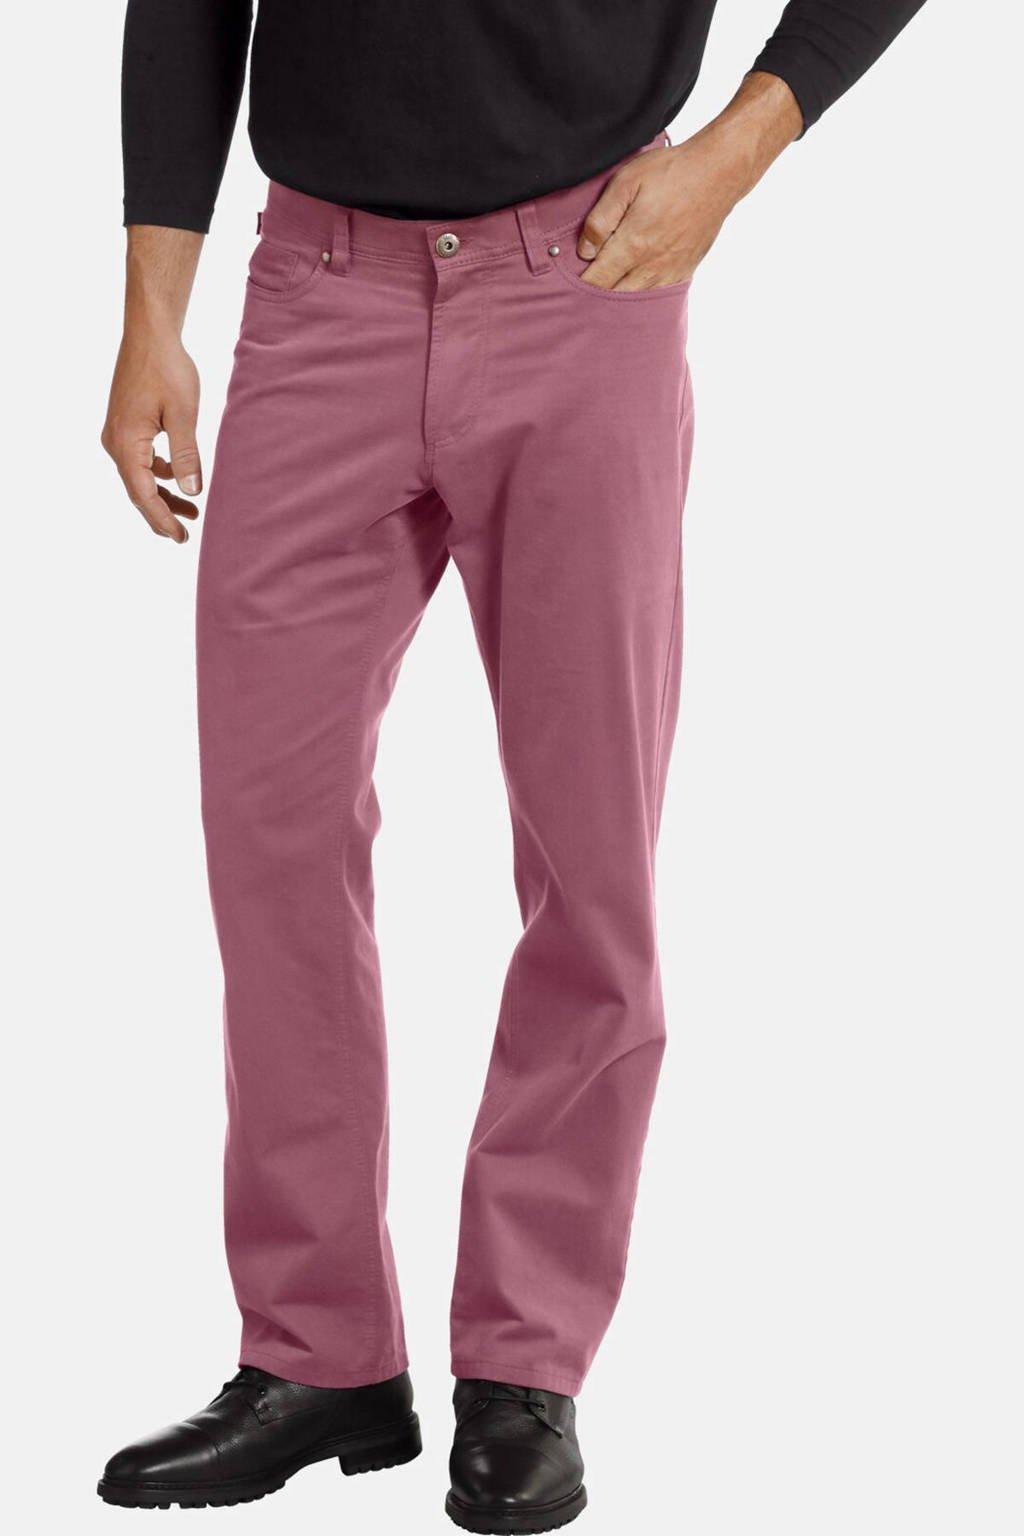 Jan Vanderstorm loose fit broek LORENS Plus Size roze, Roze